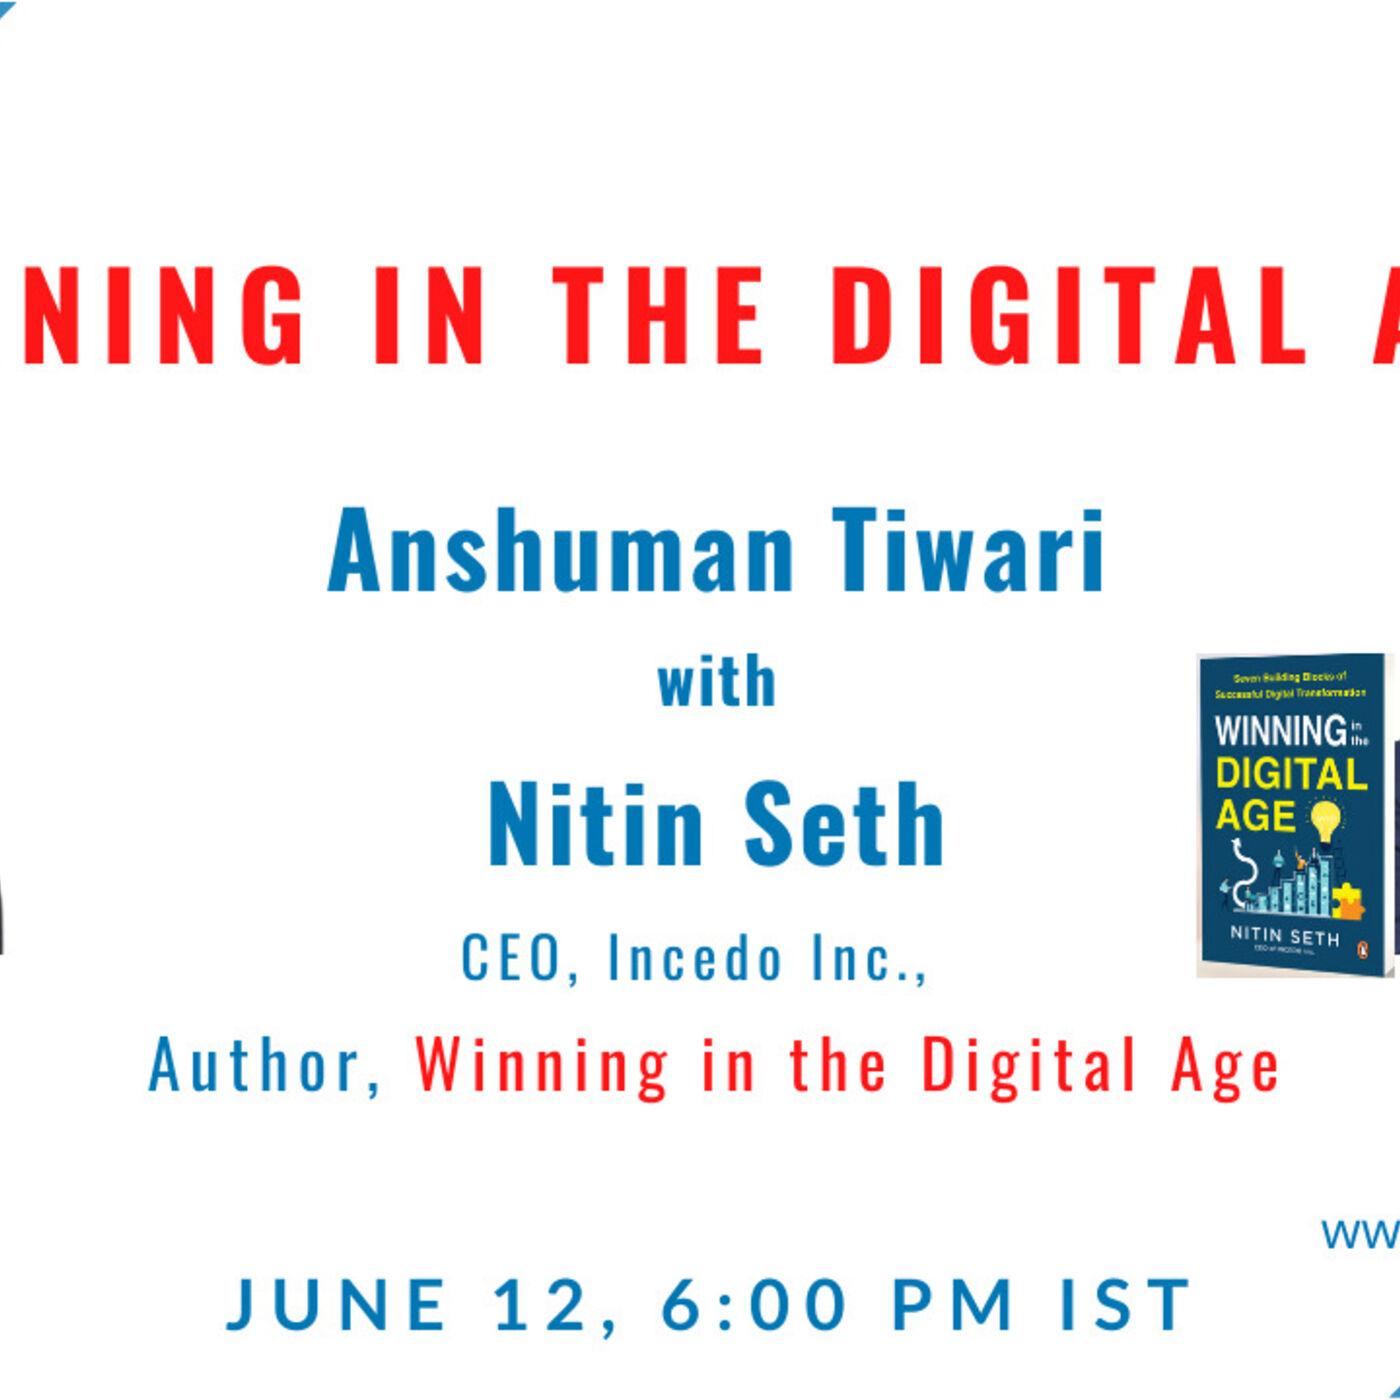 Winning in the Digital Age with Nitin Seth